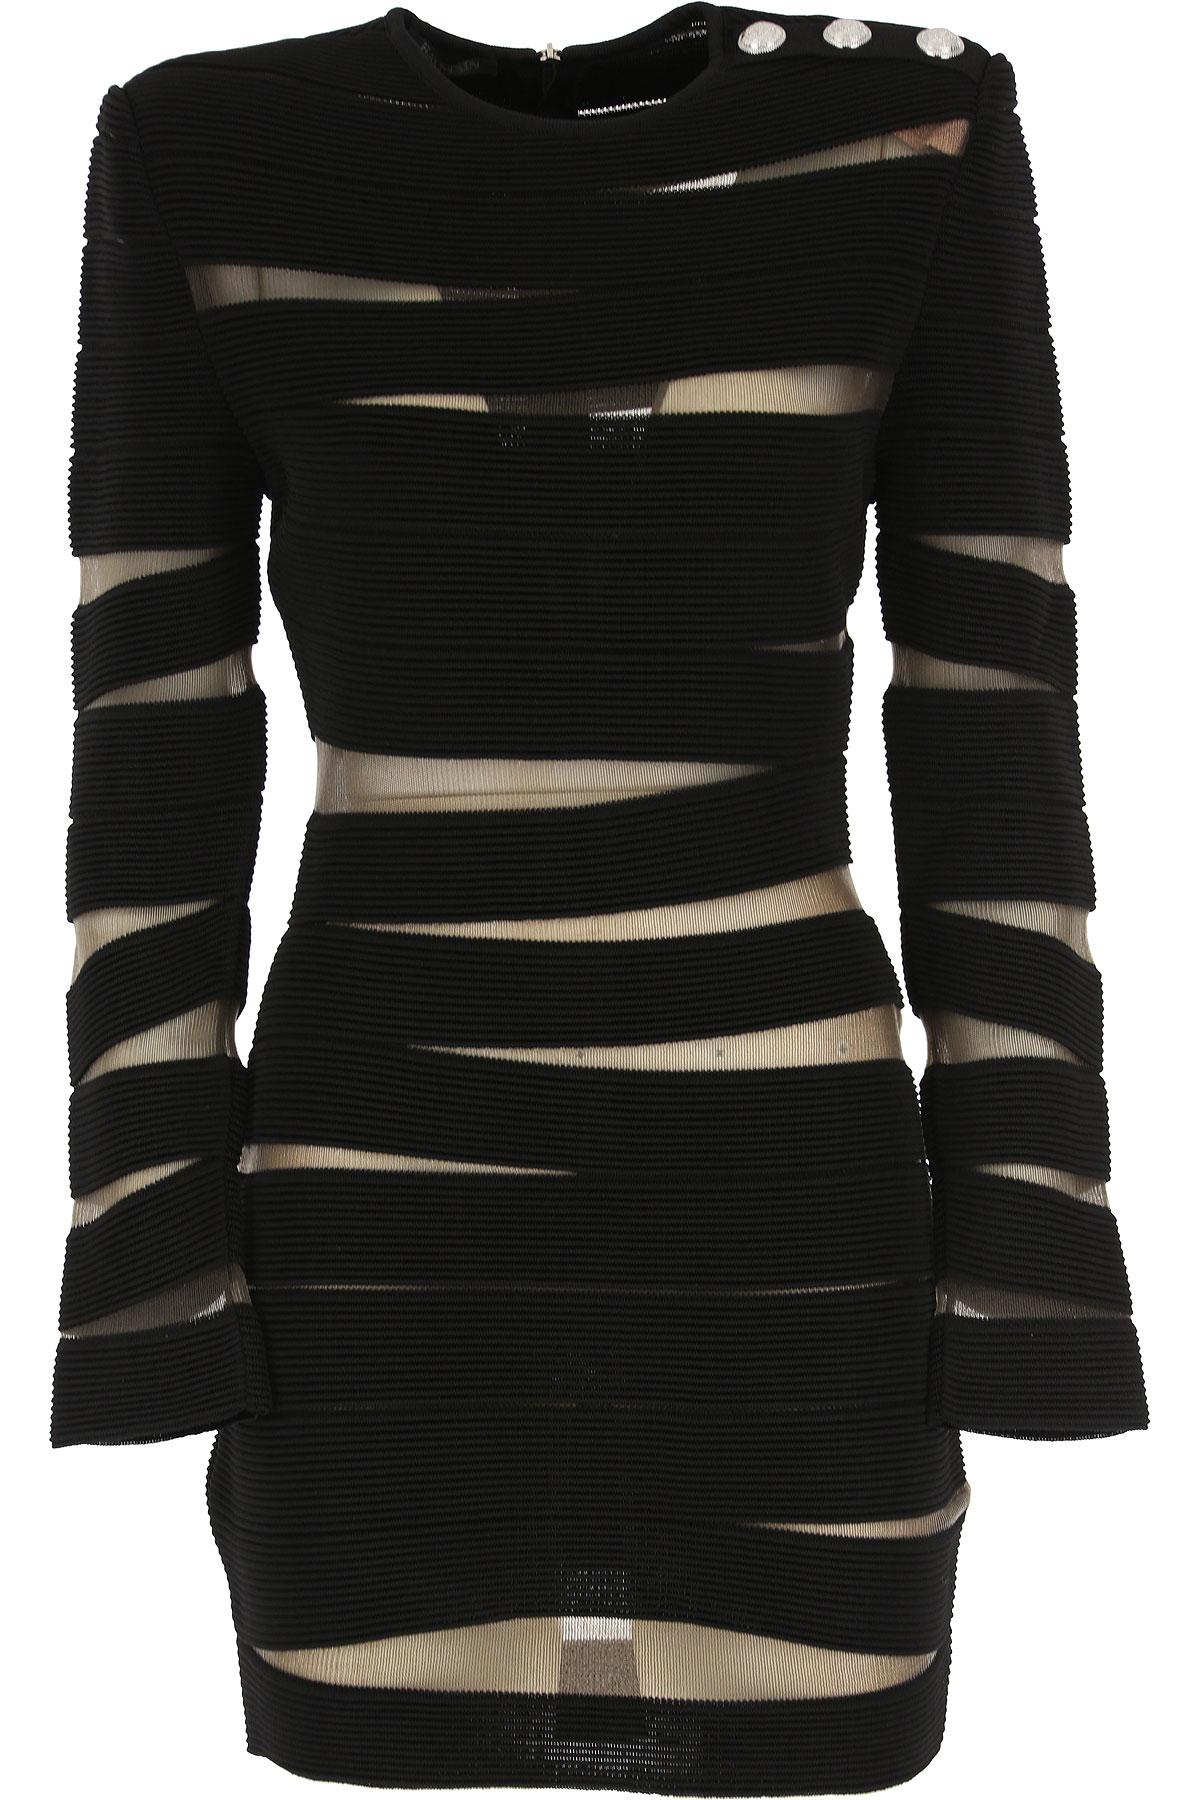 Balmain Dress for Women, Evening Cocktail Party On Sale, Black, Viscose, 2019, XXS (IT 36) US 2 - I 38 - GB 6 - F 34